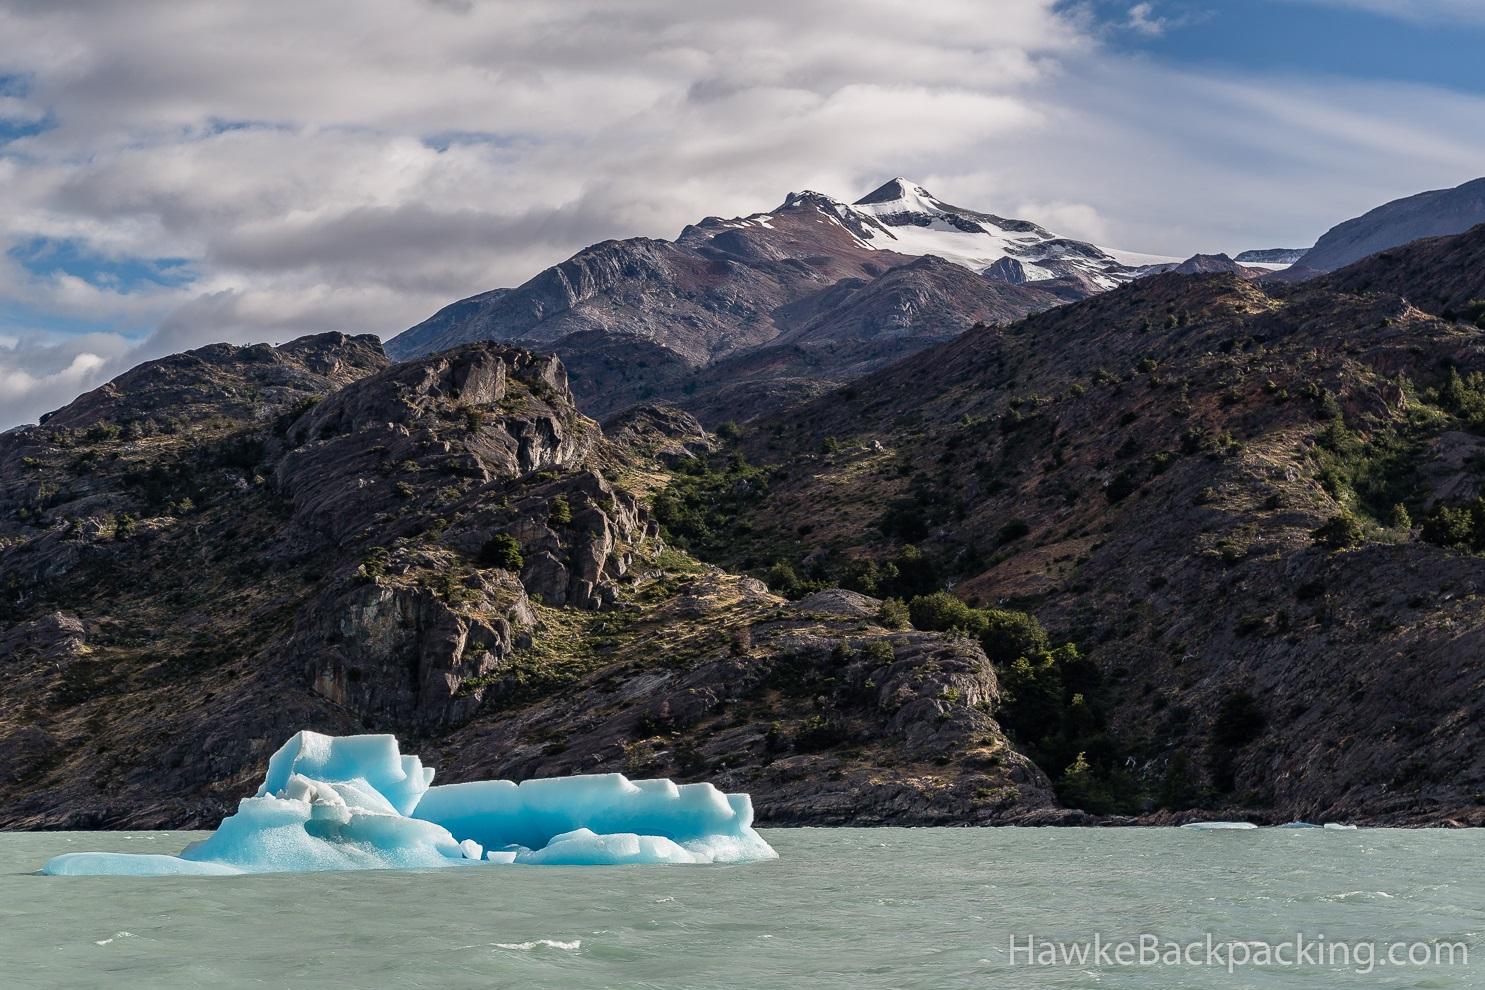 Los Glaciares National Park - HawkeBackpacking.com